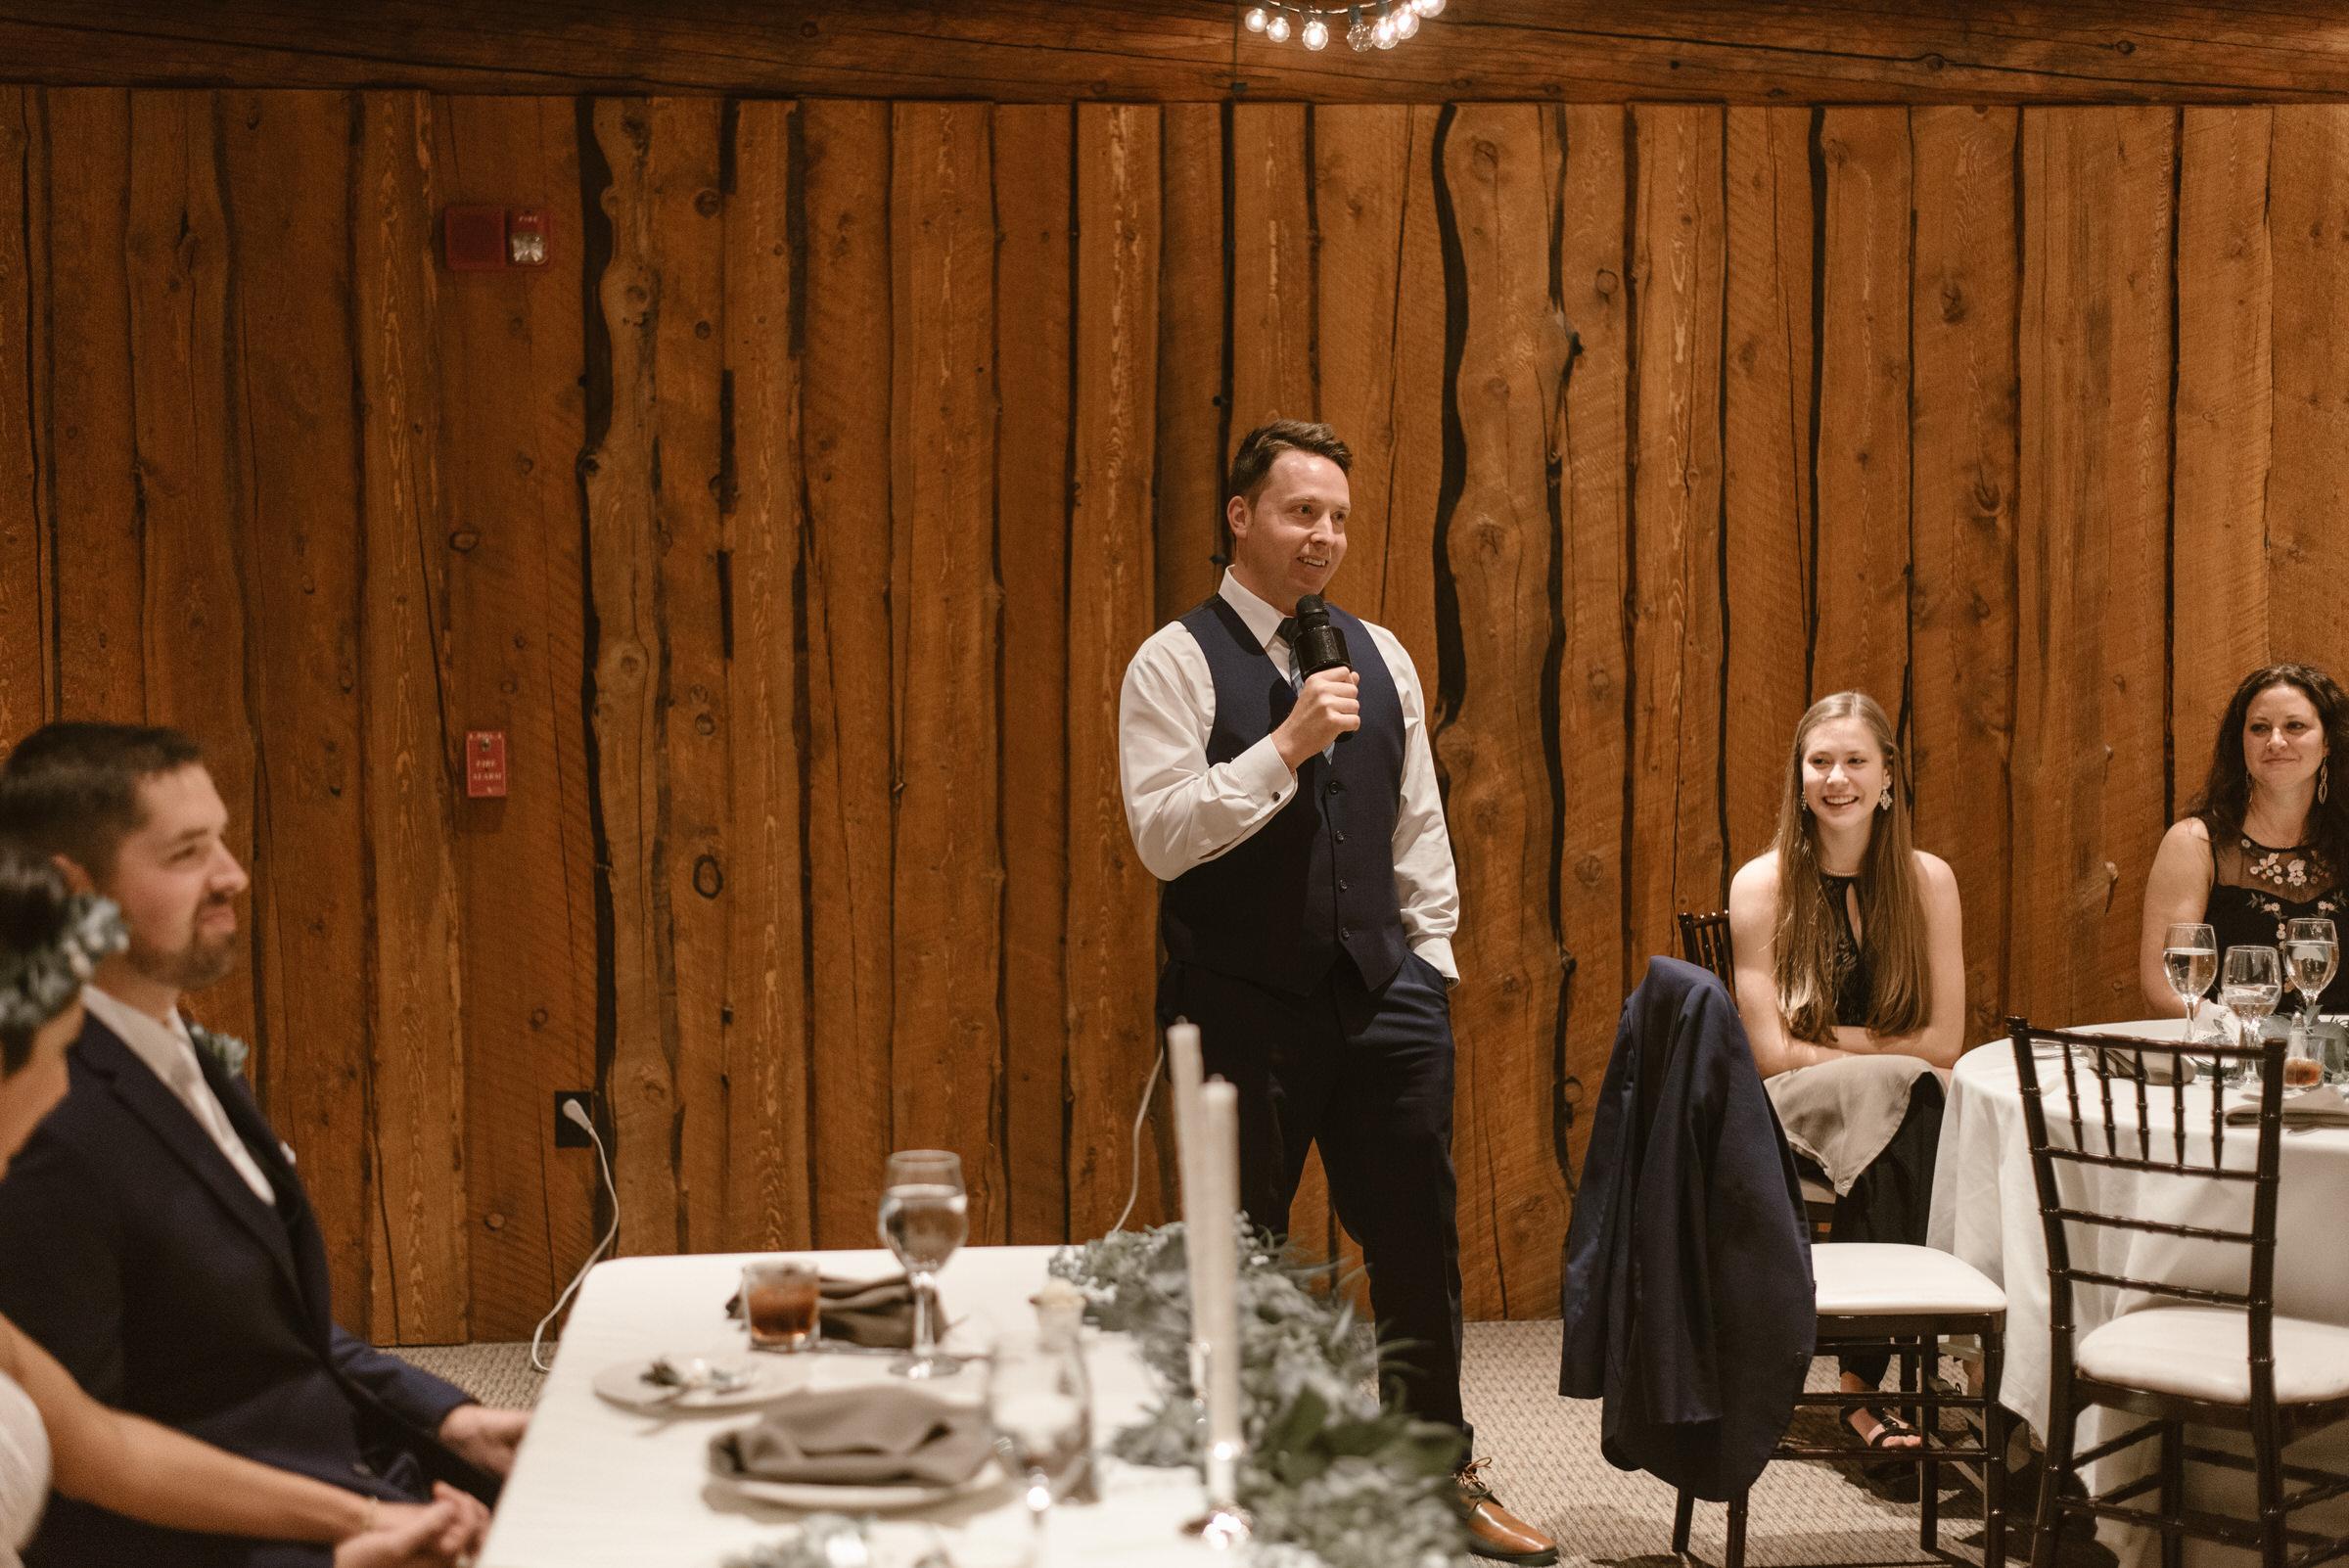 Wilderness-Ridge-Lincoln-Nebraska-Wedding-Kaylie-Sirek-Photography-110.jpg